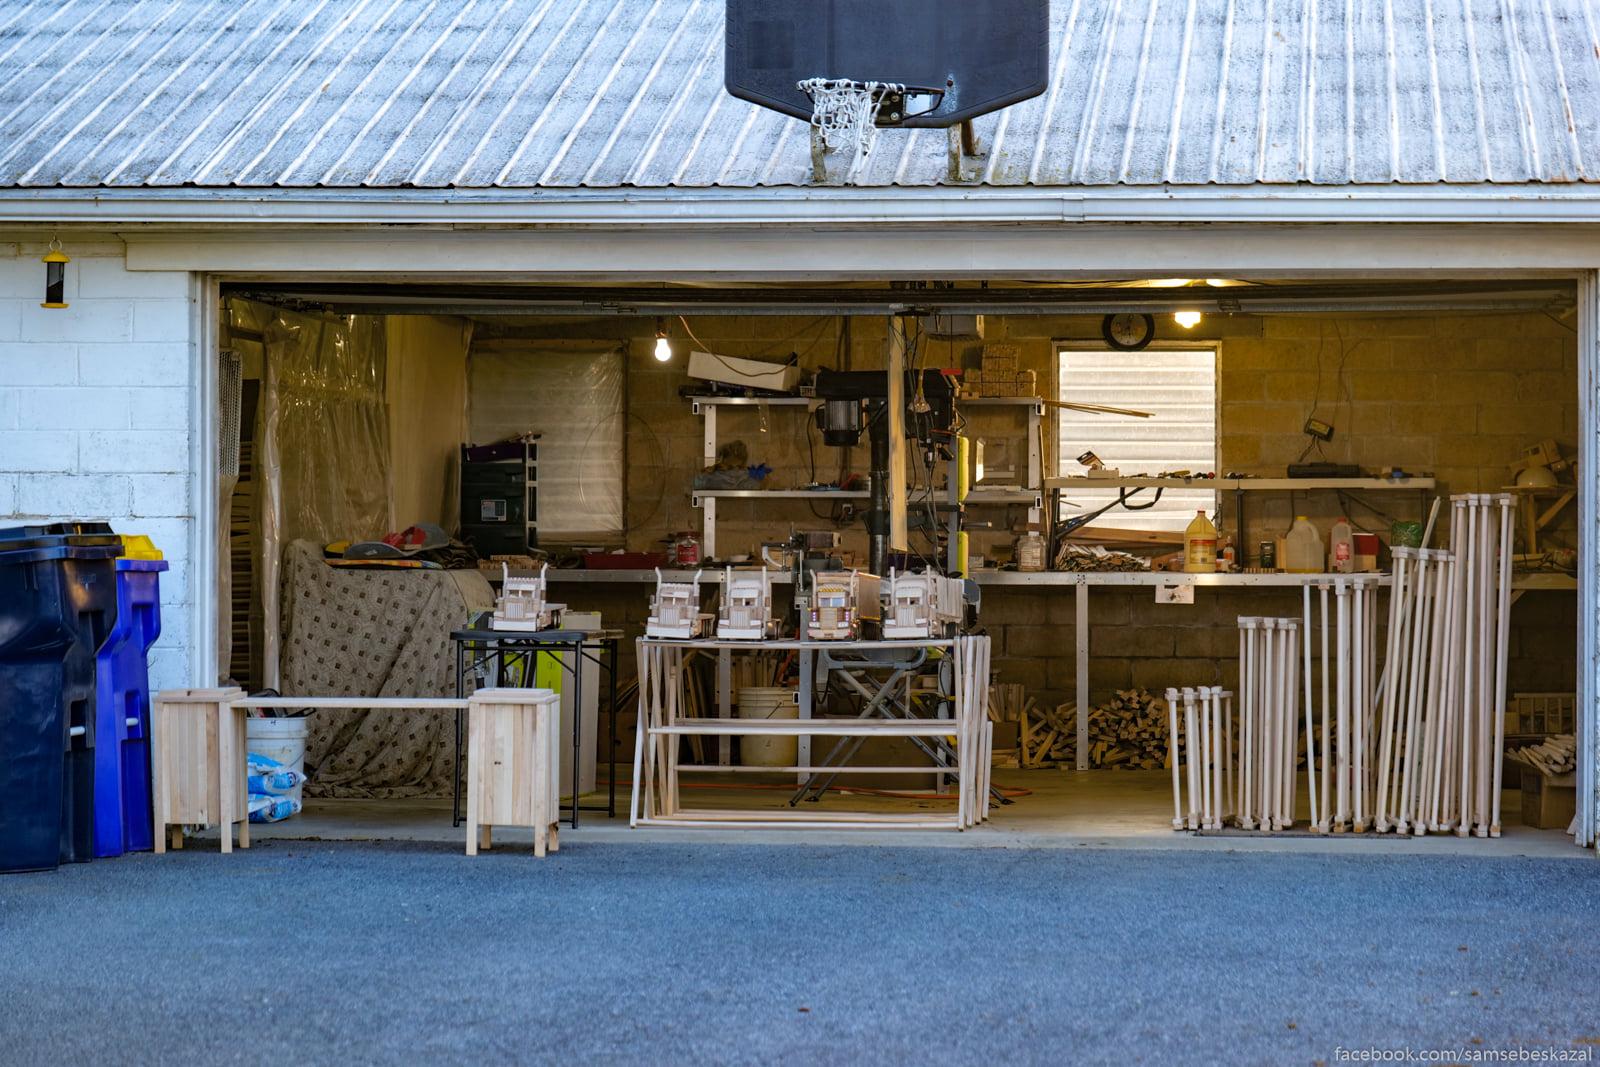 Muzik delaet v svoem garaze...